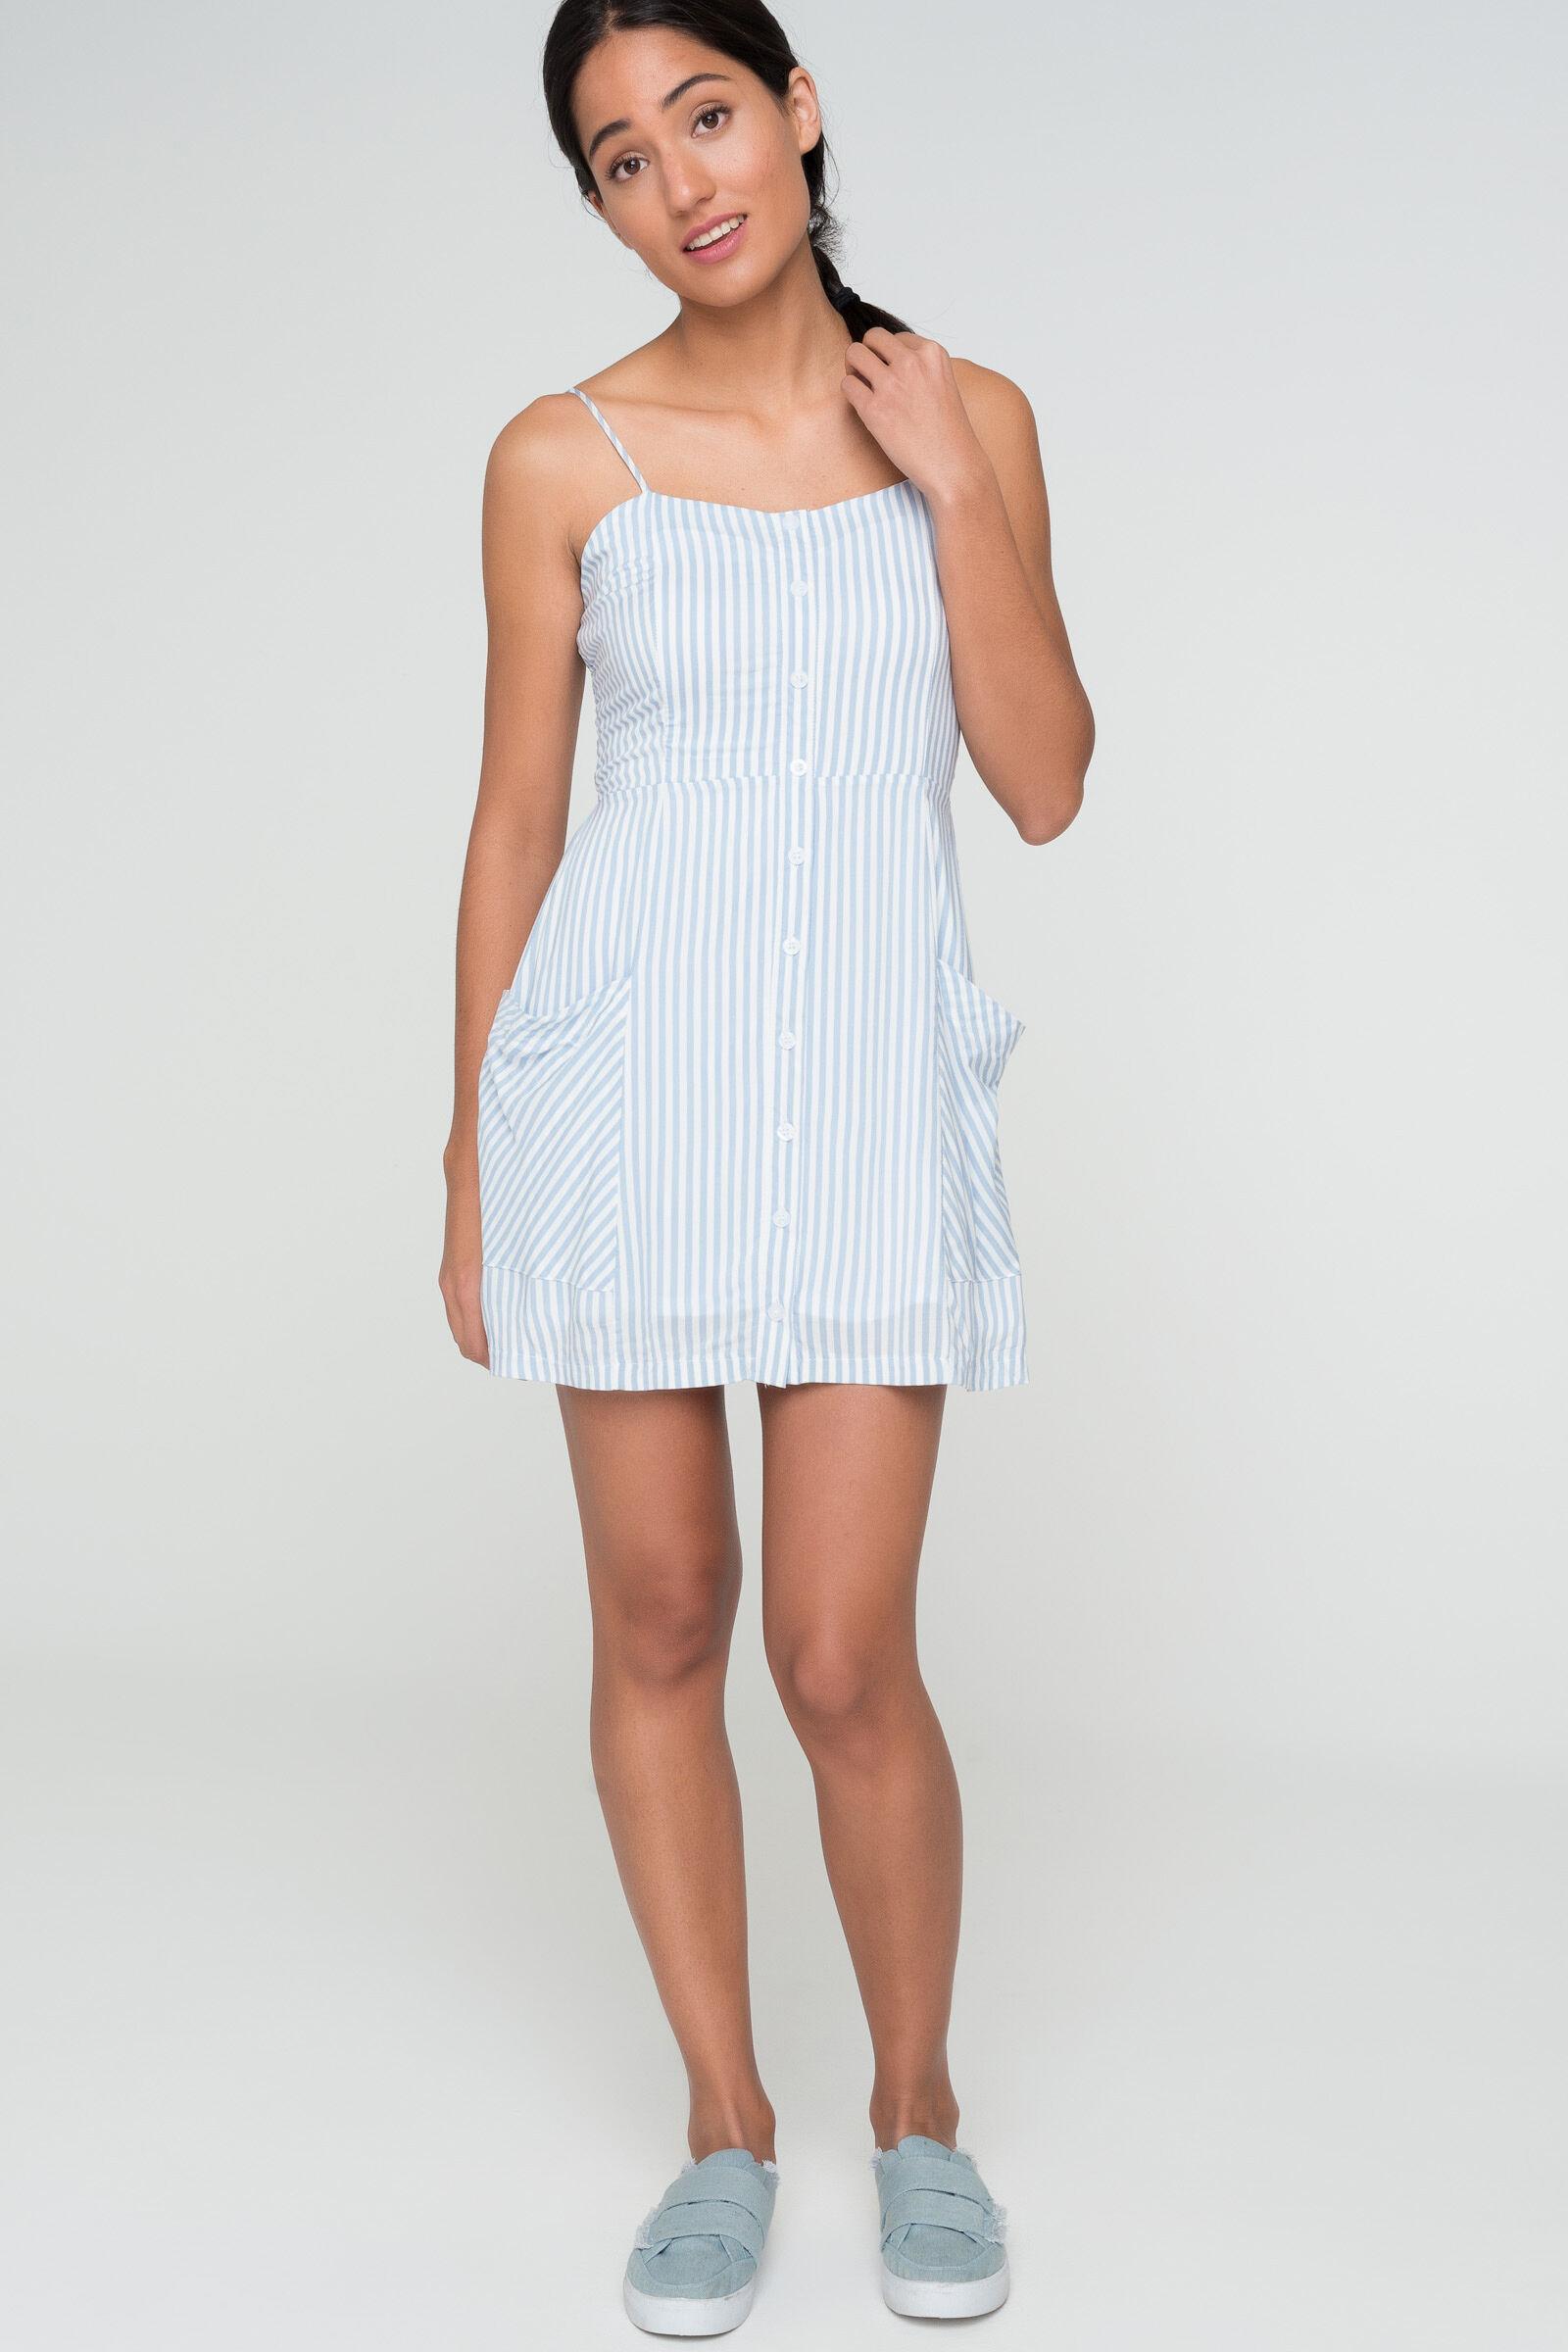 Ardenes summer dresses